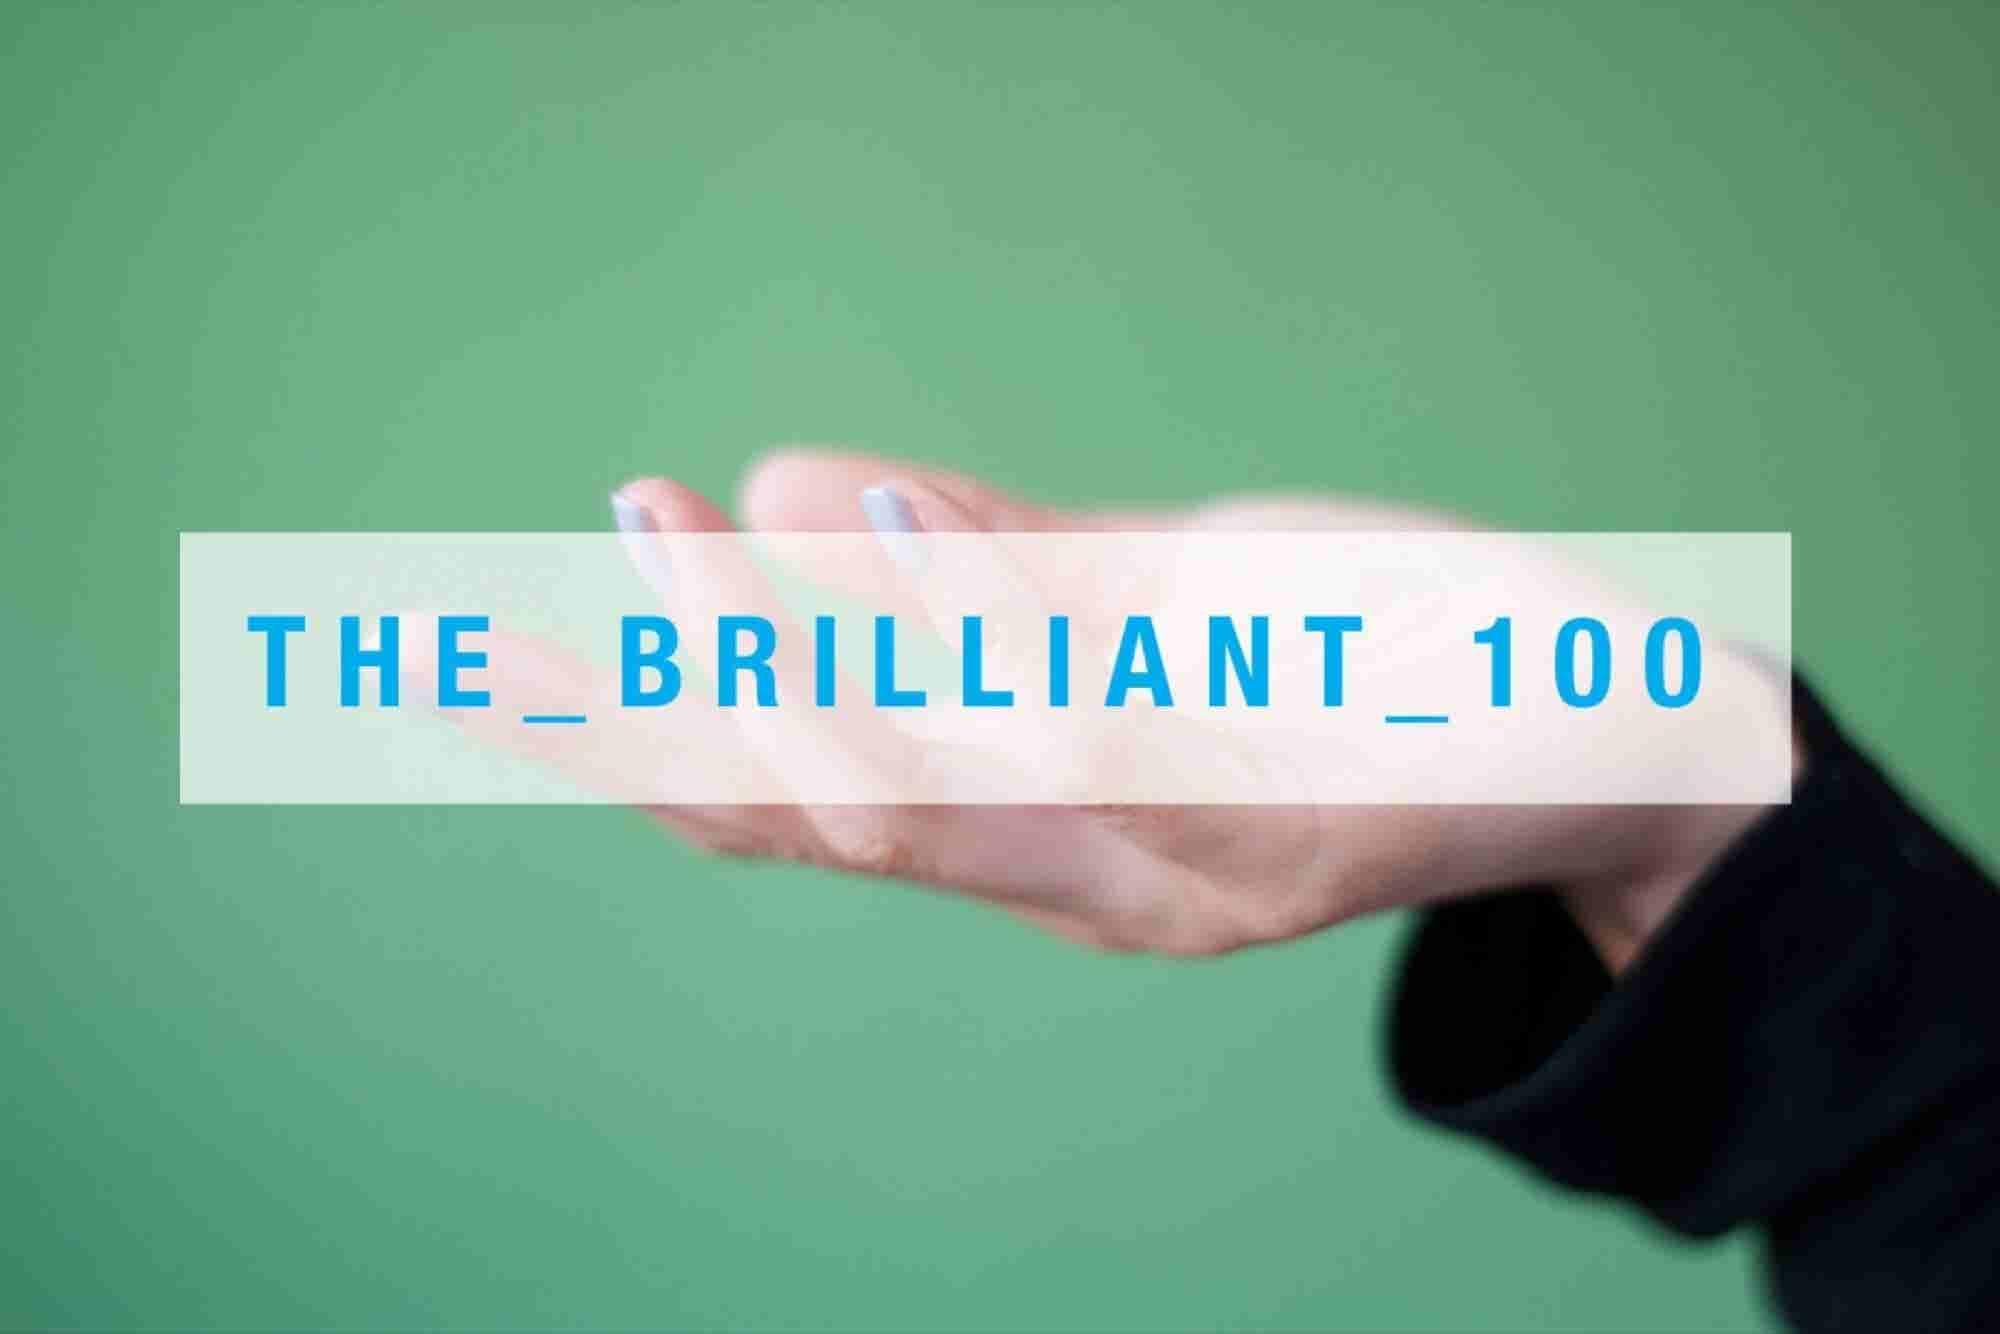 10 On-Demand Services to Watch 2016 - Entrepreneur's Brilliant 100